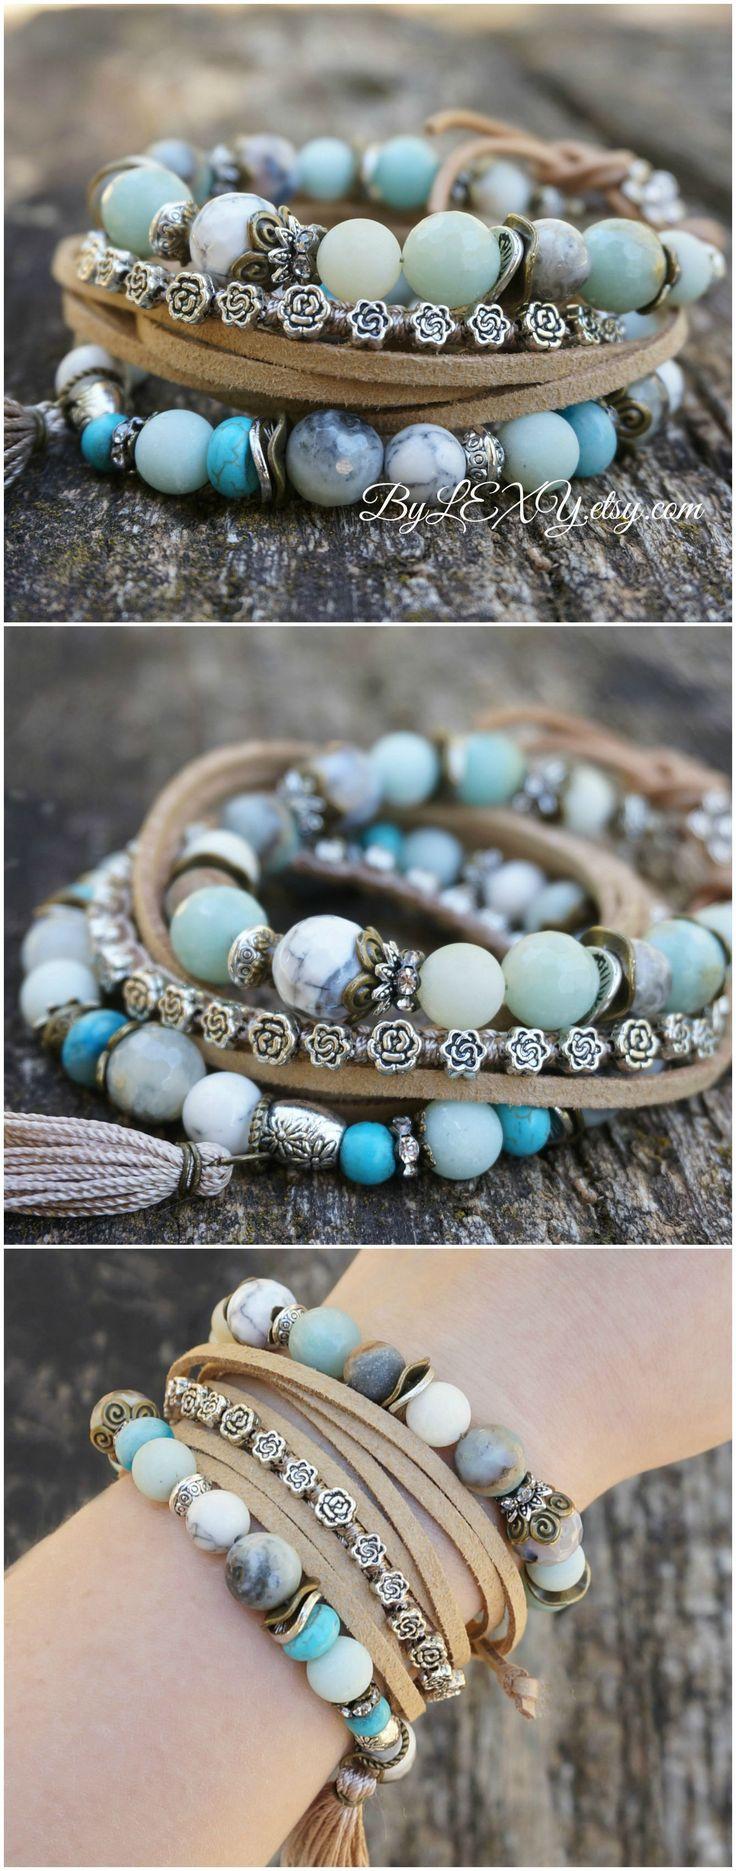 "Set of 3 Boho ""Low Tide"" Wrap Stretch Bracelets, Bohemian Hippie Gypsy Chic Nature Earthy Floral Stack Bracelets ByLEXY #gypsystack, #bohemianbracelet, #bohojewelry, #stackbracelets, #gypsybracelet, #hippiebracelet, #hippiejewelry, #boho, #beachy, #bohochicjewelry"